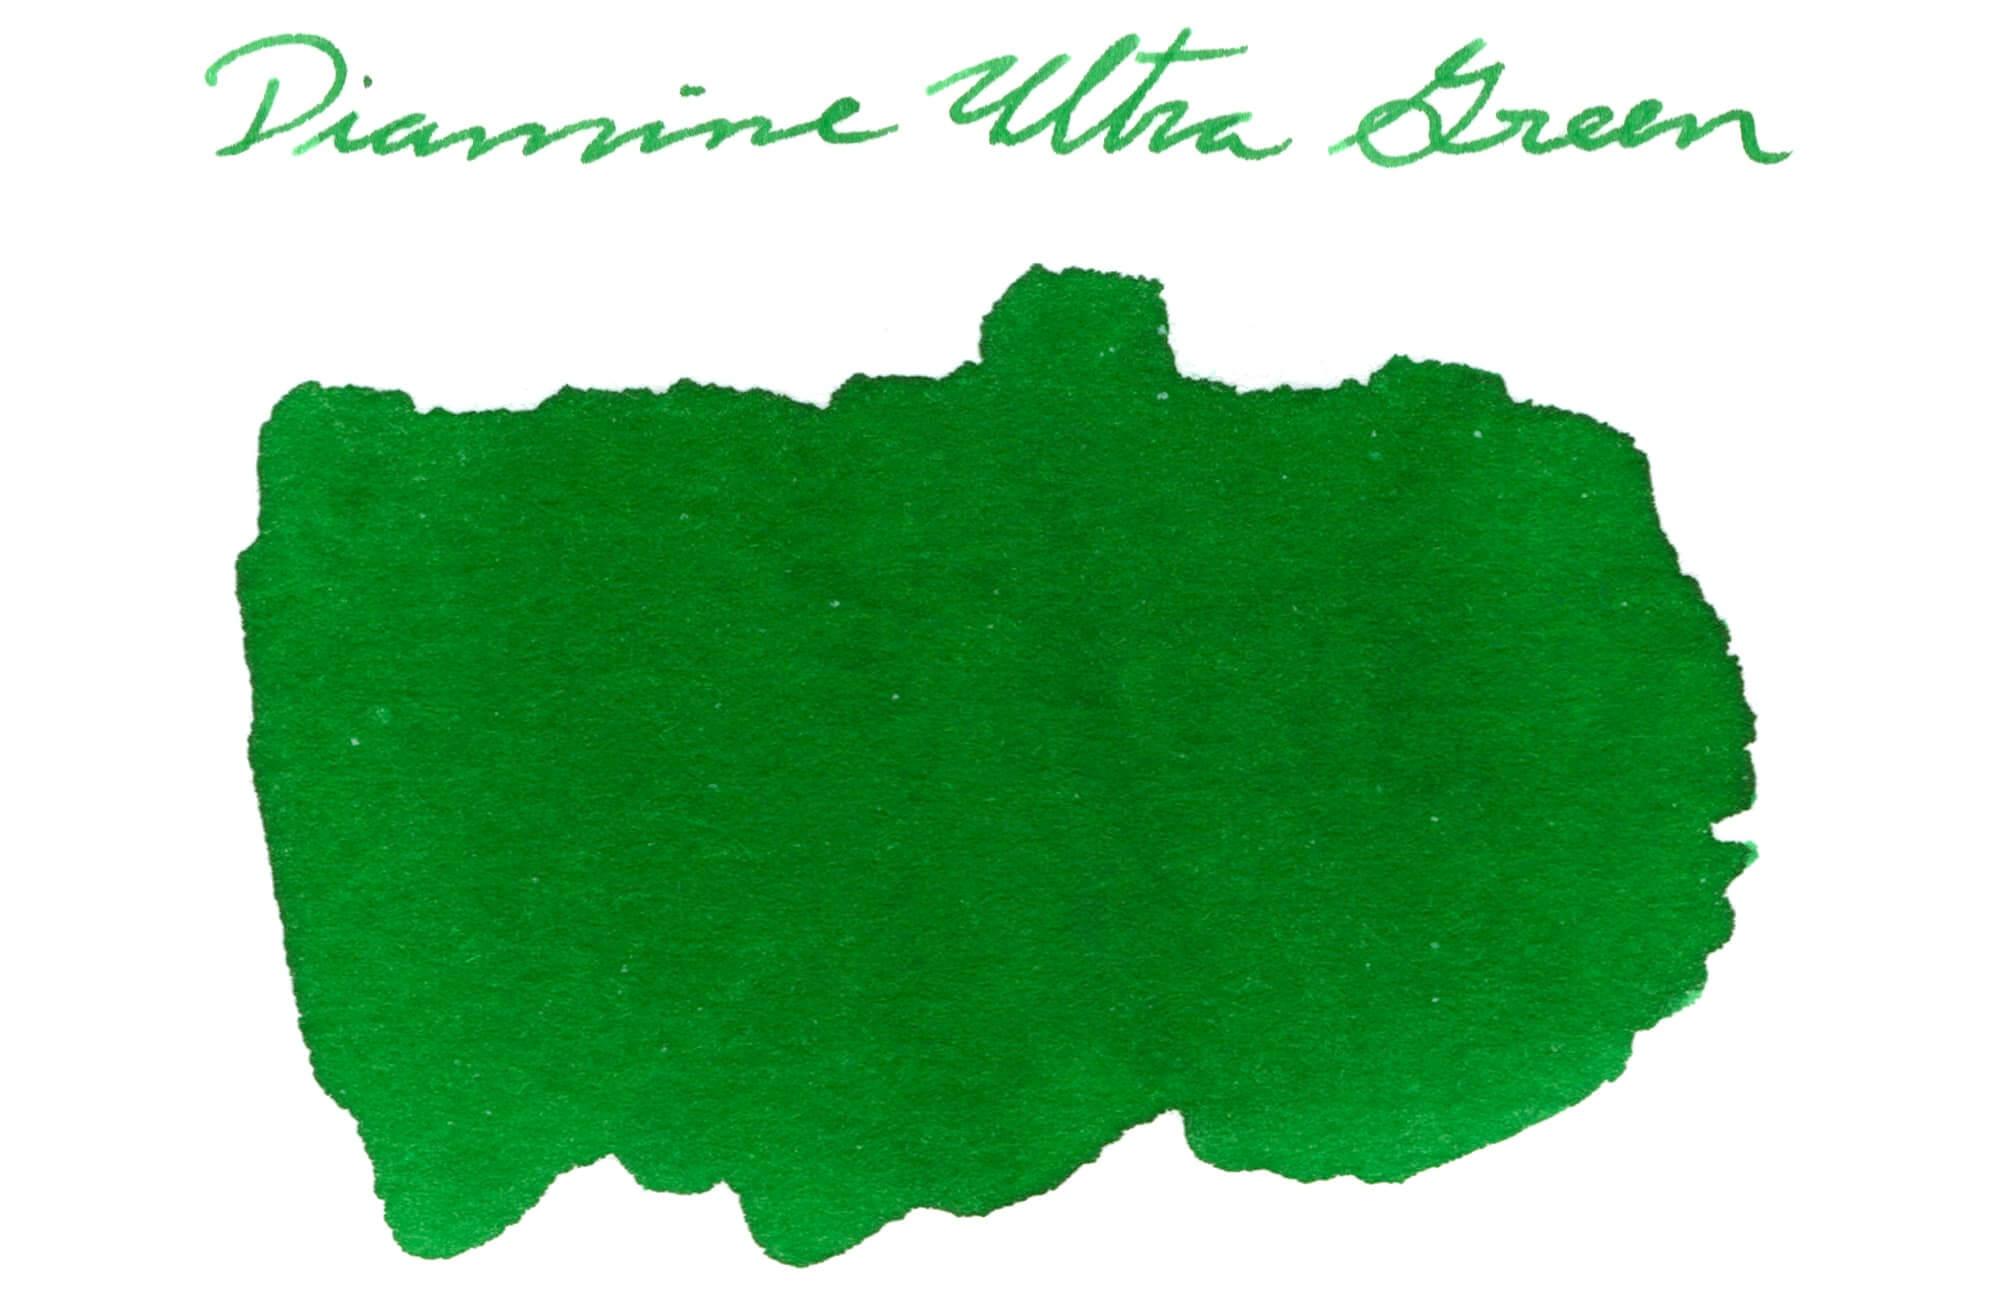 Diamine Ultra Green